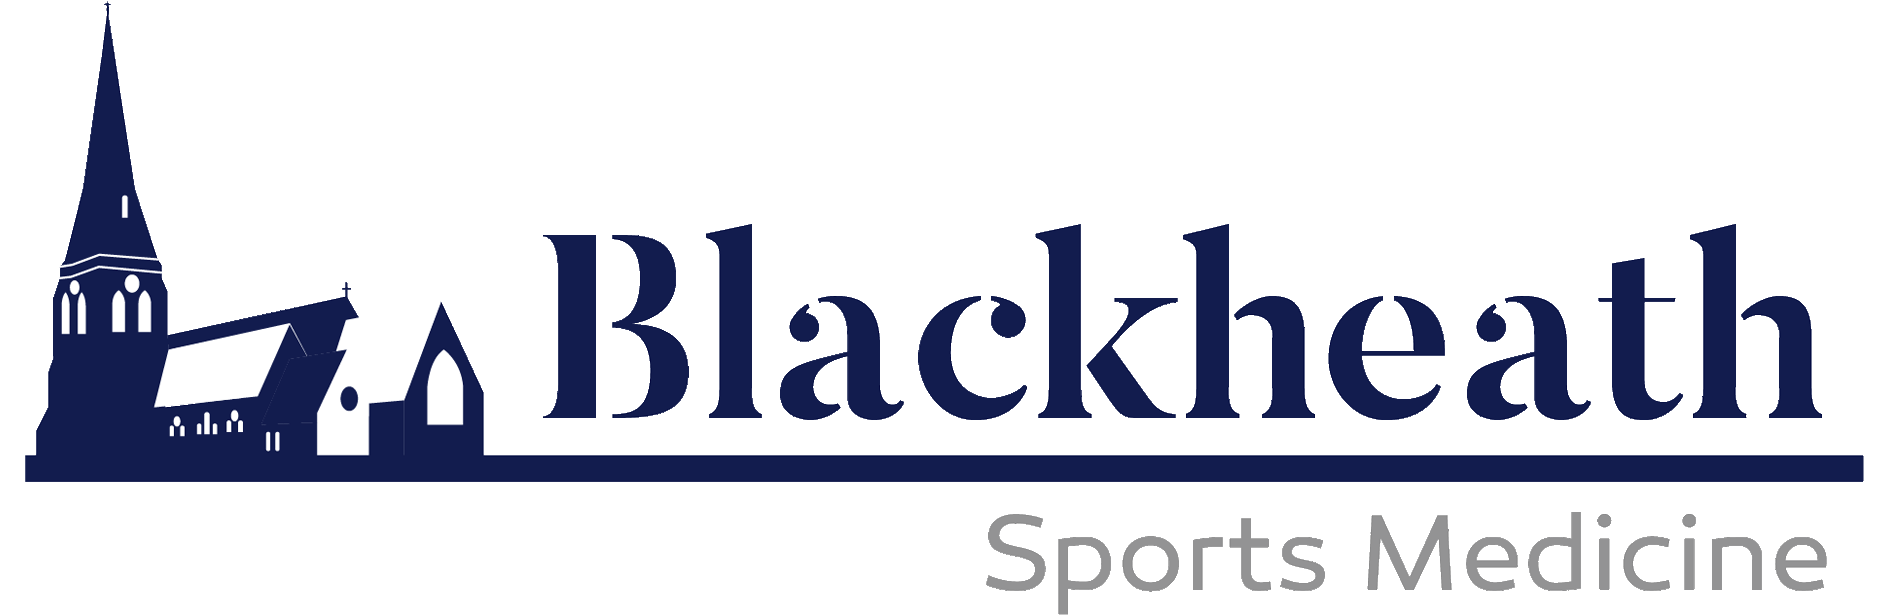 Blackheath London Bridge Sports Medicine Logo